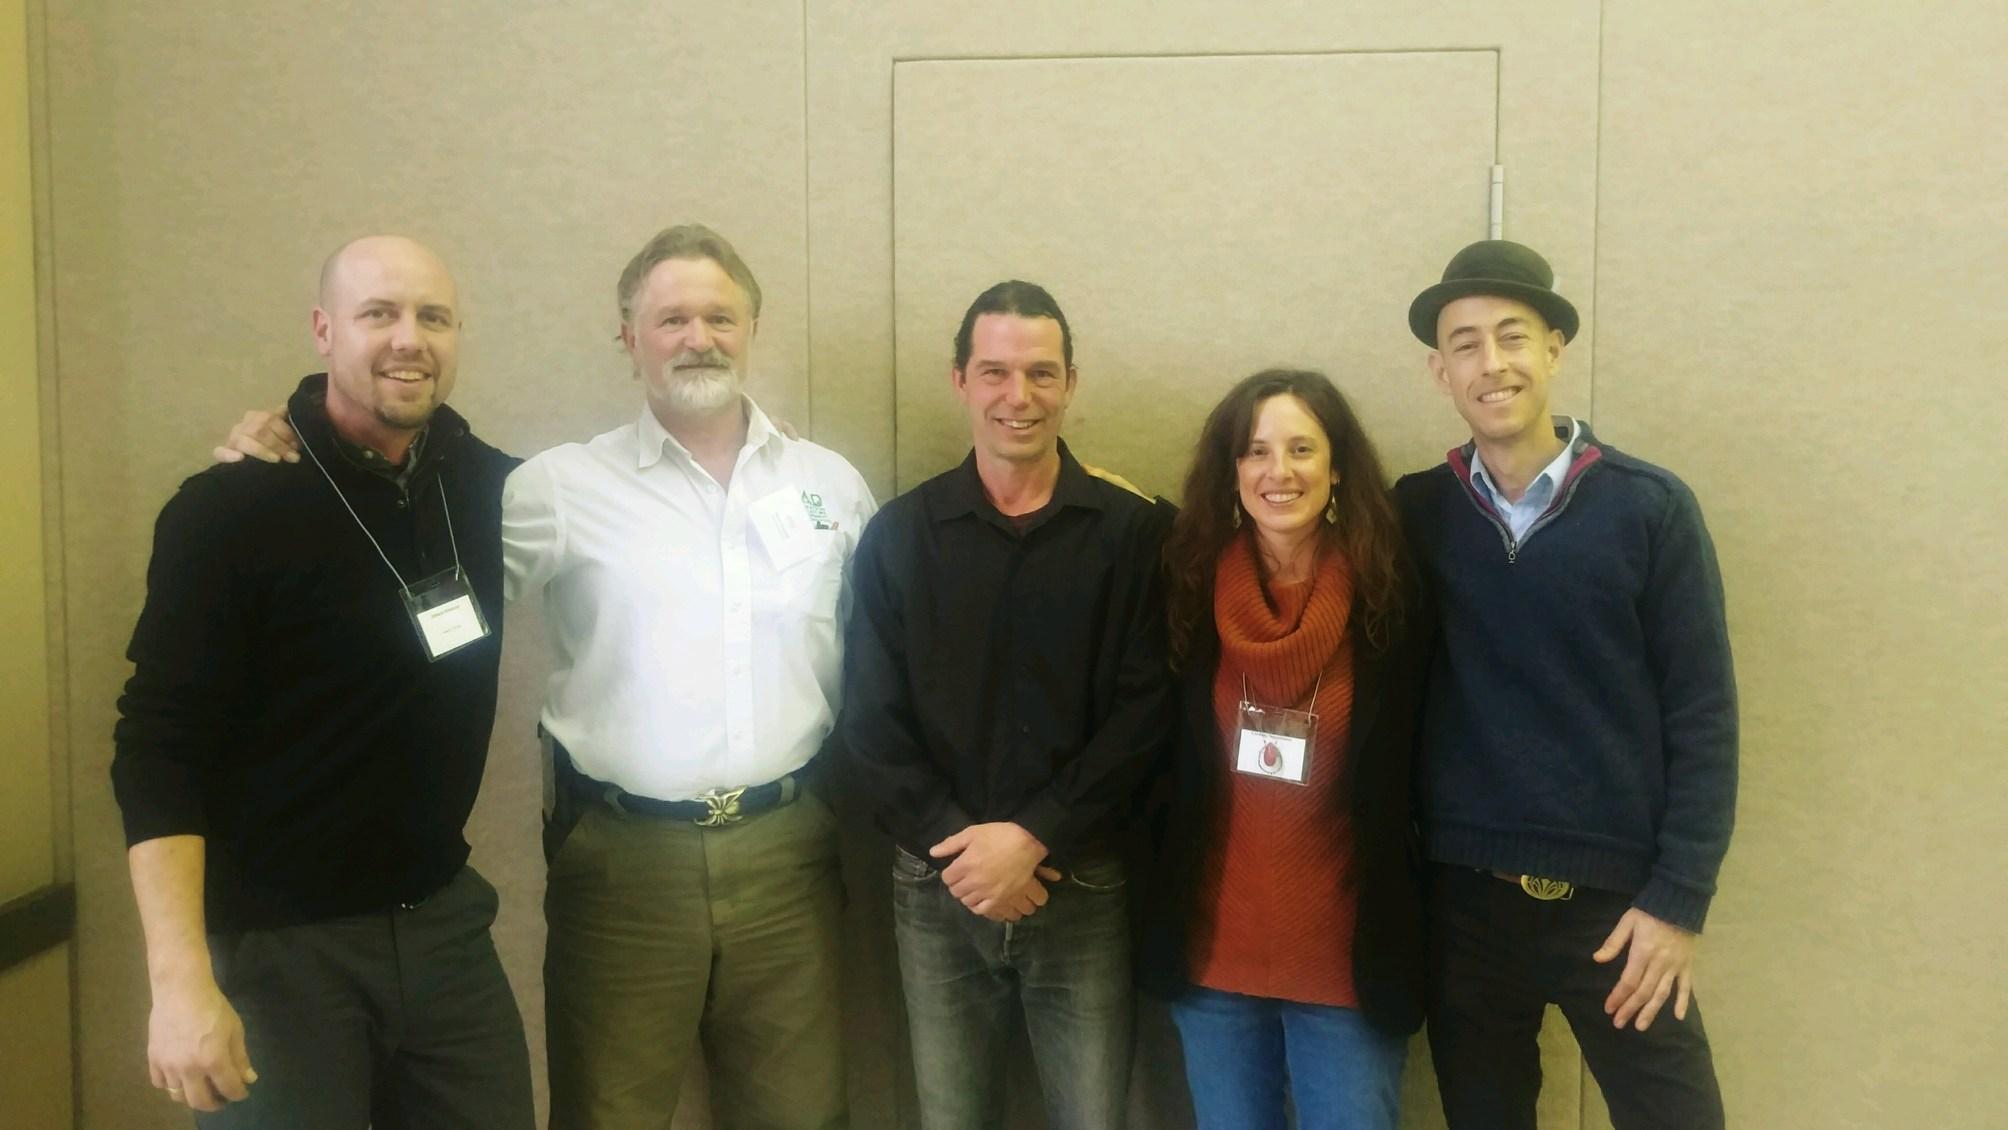 (Pictured left to right: Johann Rinkens, Mark Shepard, Andrew Faust, Lindsay Napolitano, Michael Judd)